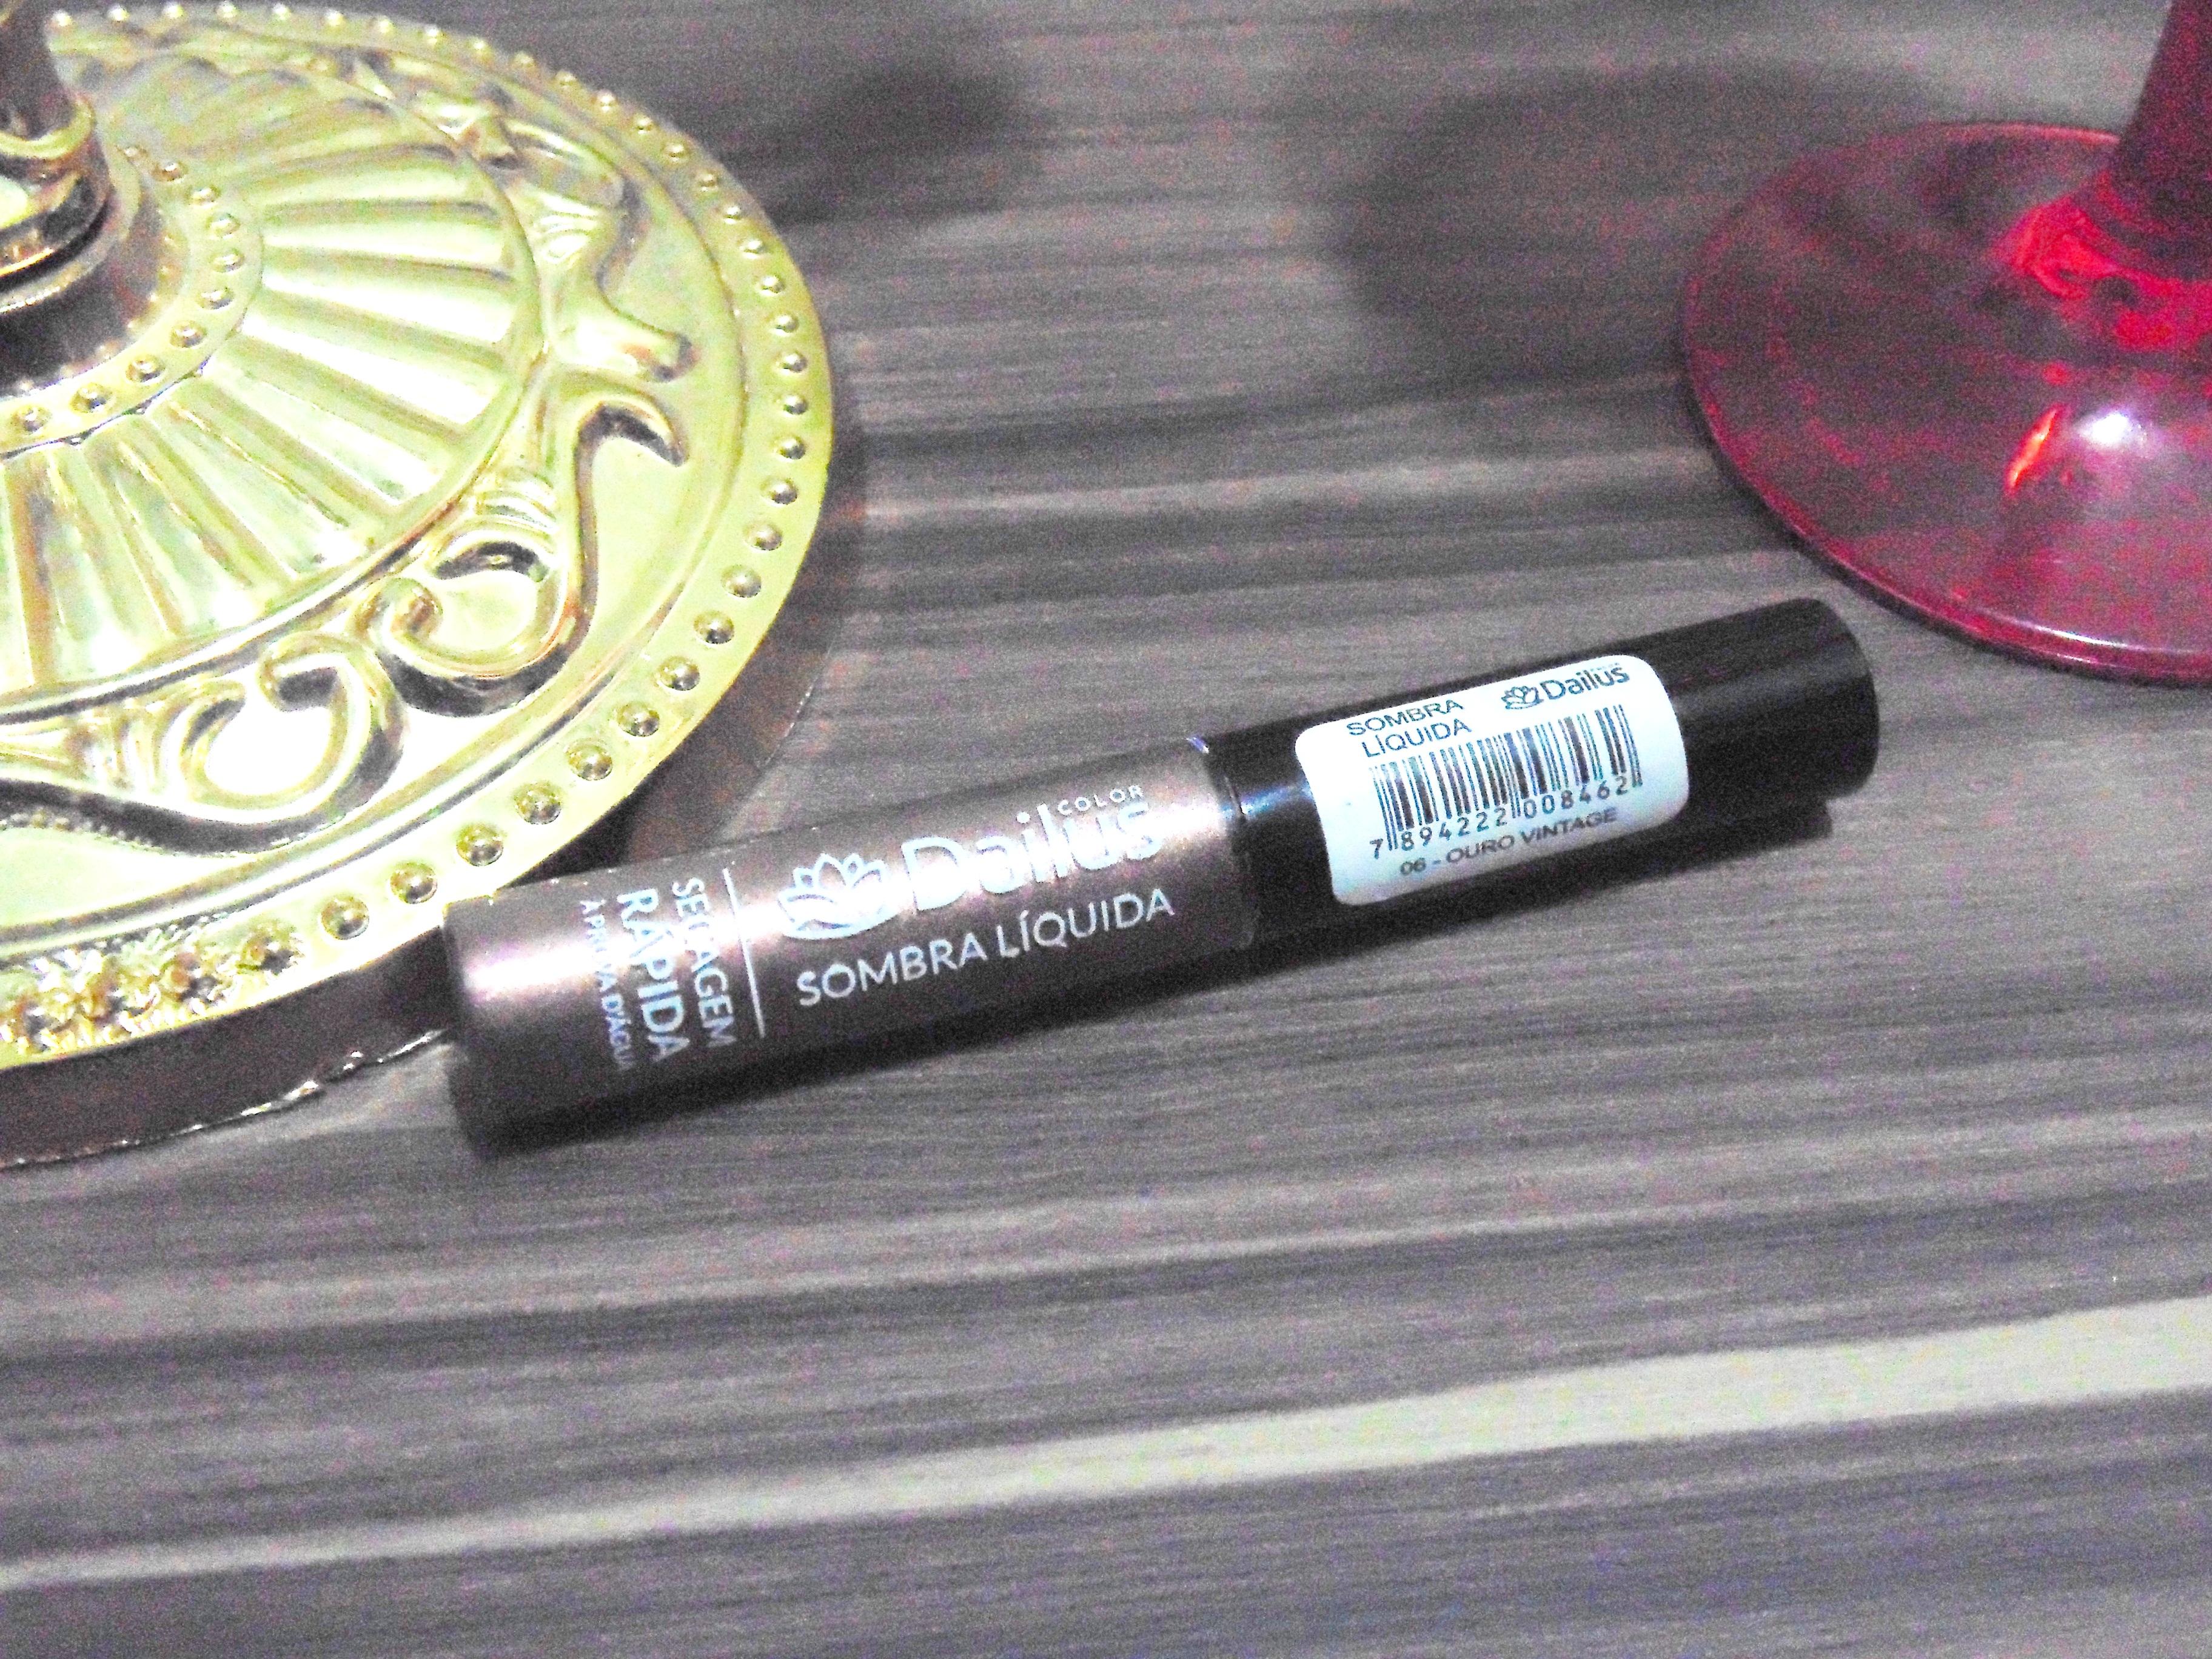 DSC04025 Eu uso eu indico: Sombra Liquida Dailus - Ouro vintage